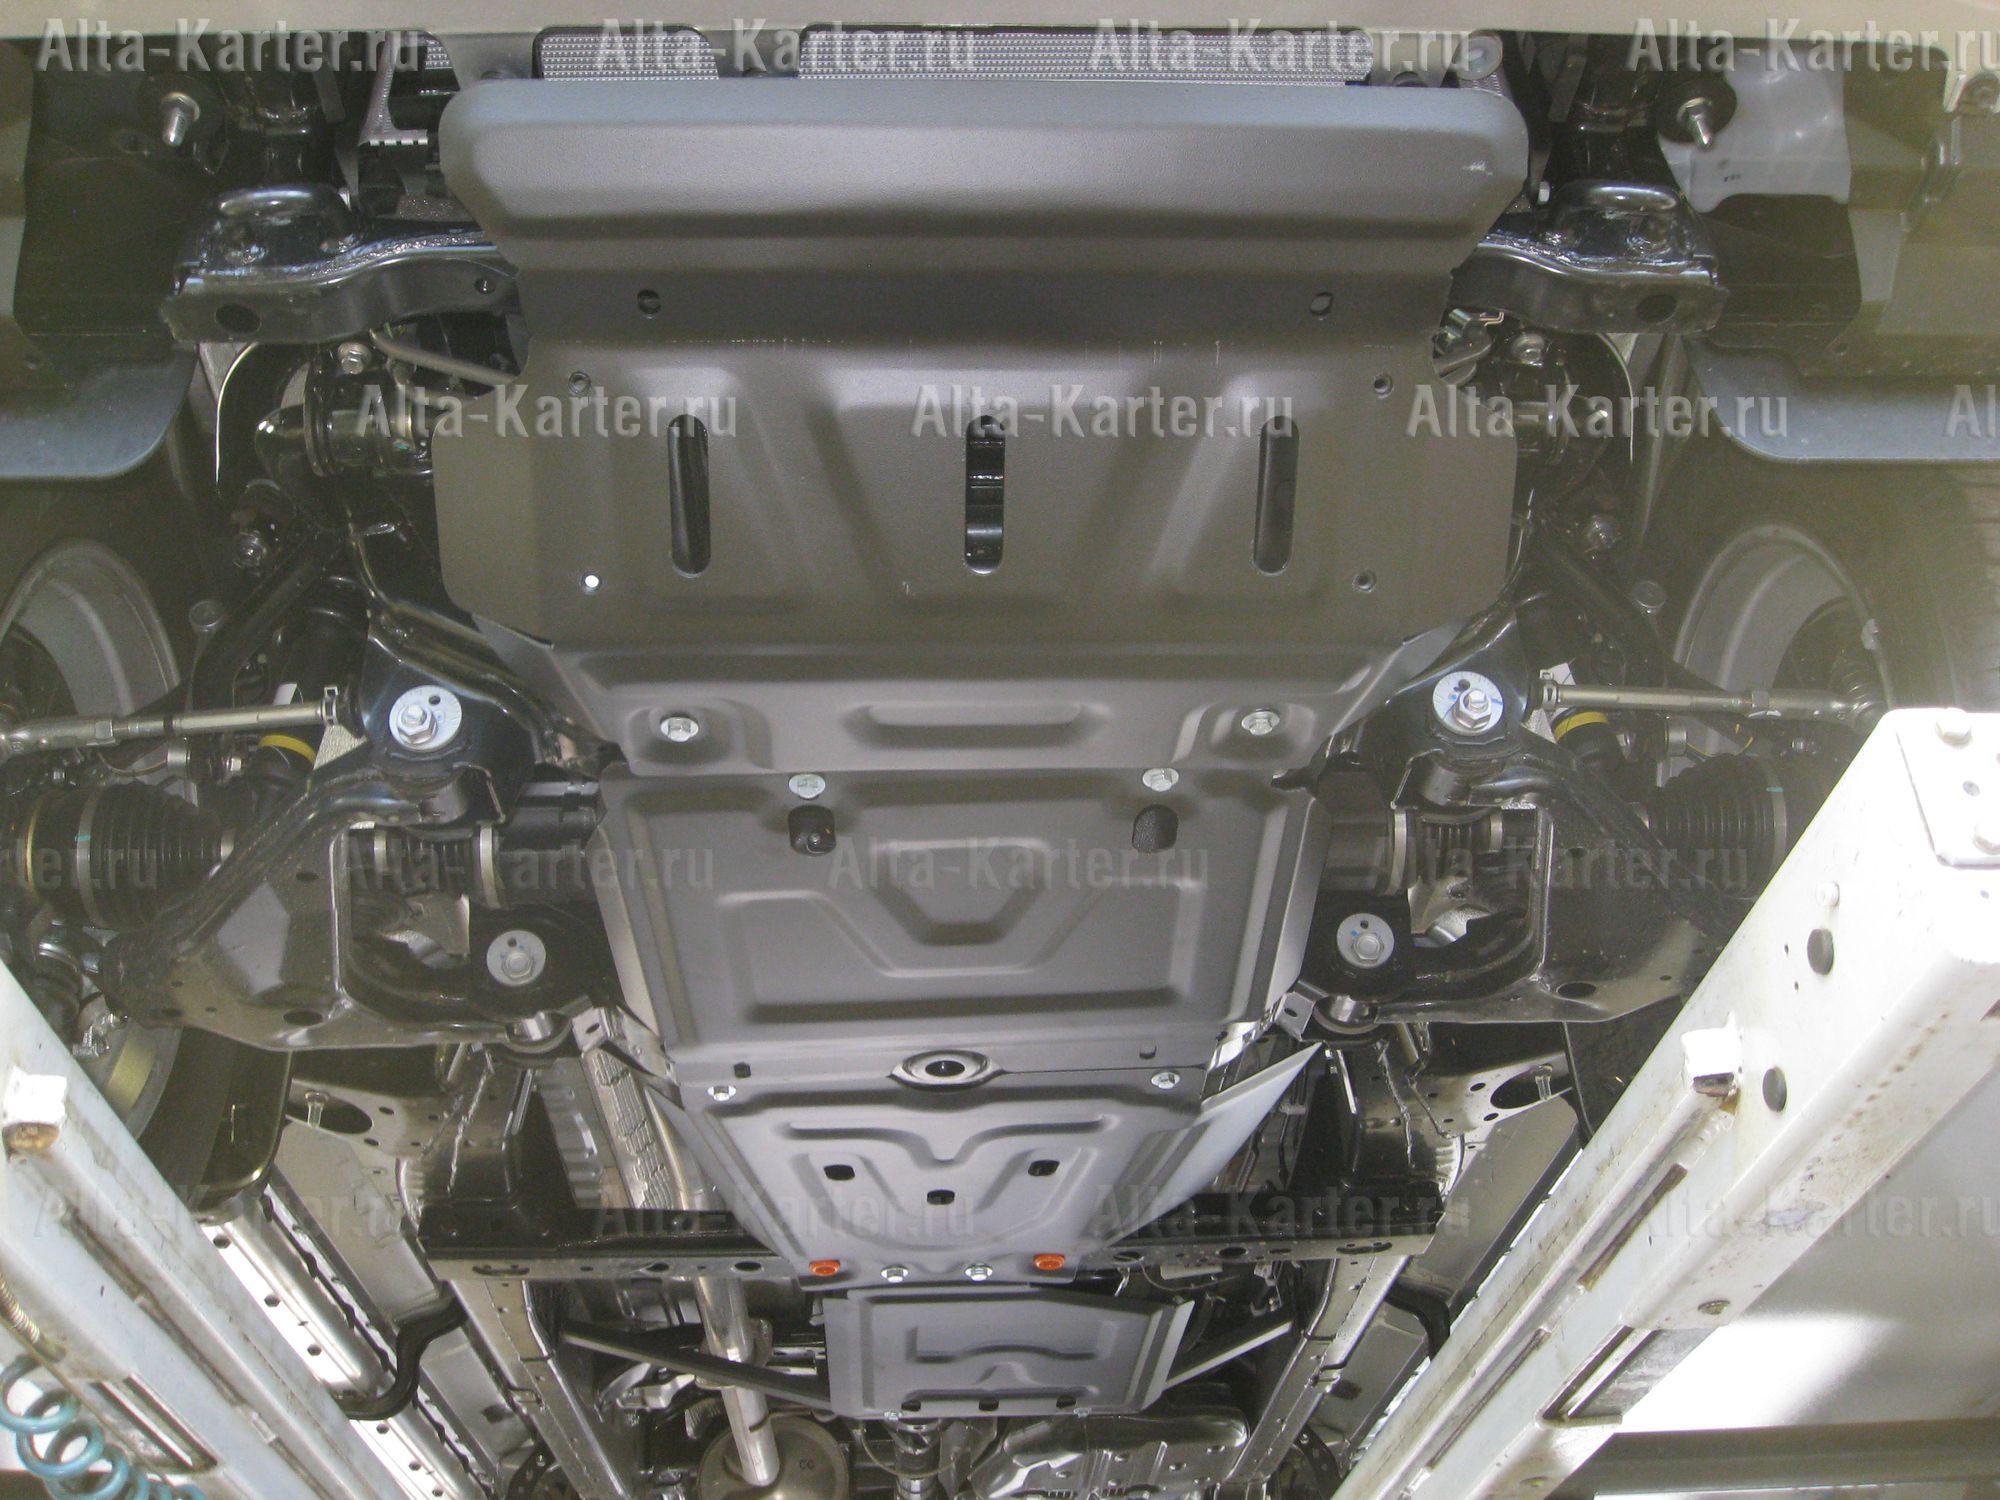 Защита 'Alfeco' для радиатора, картера, редуктора переднего моста, КПП, раздатки Toyota Hilux VII 2006-2015. Артикул ALF.24.90,91,92,93